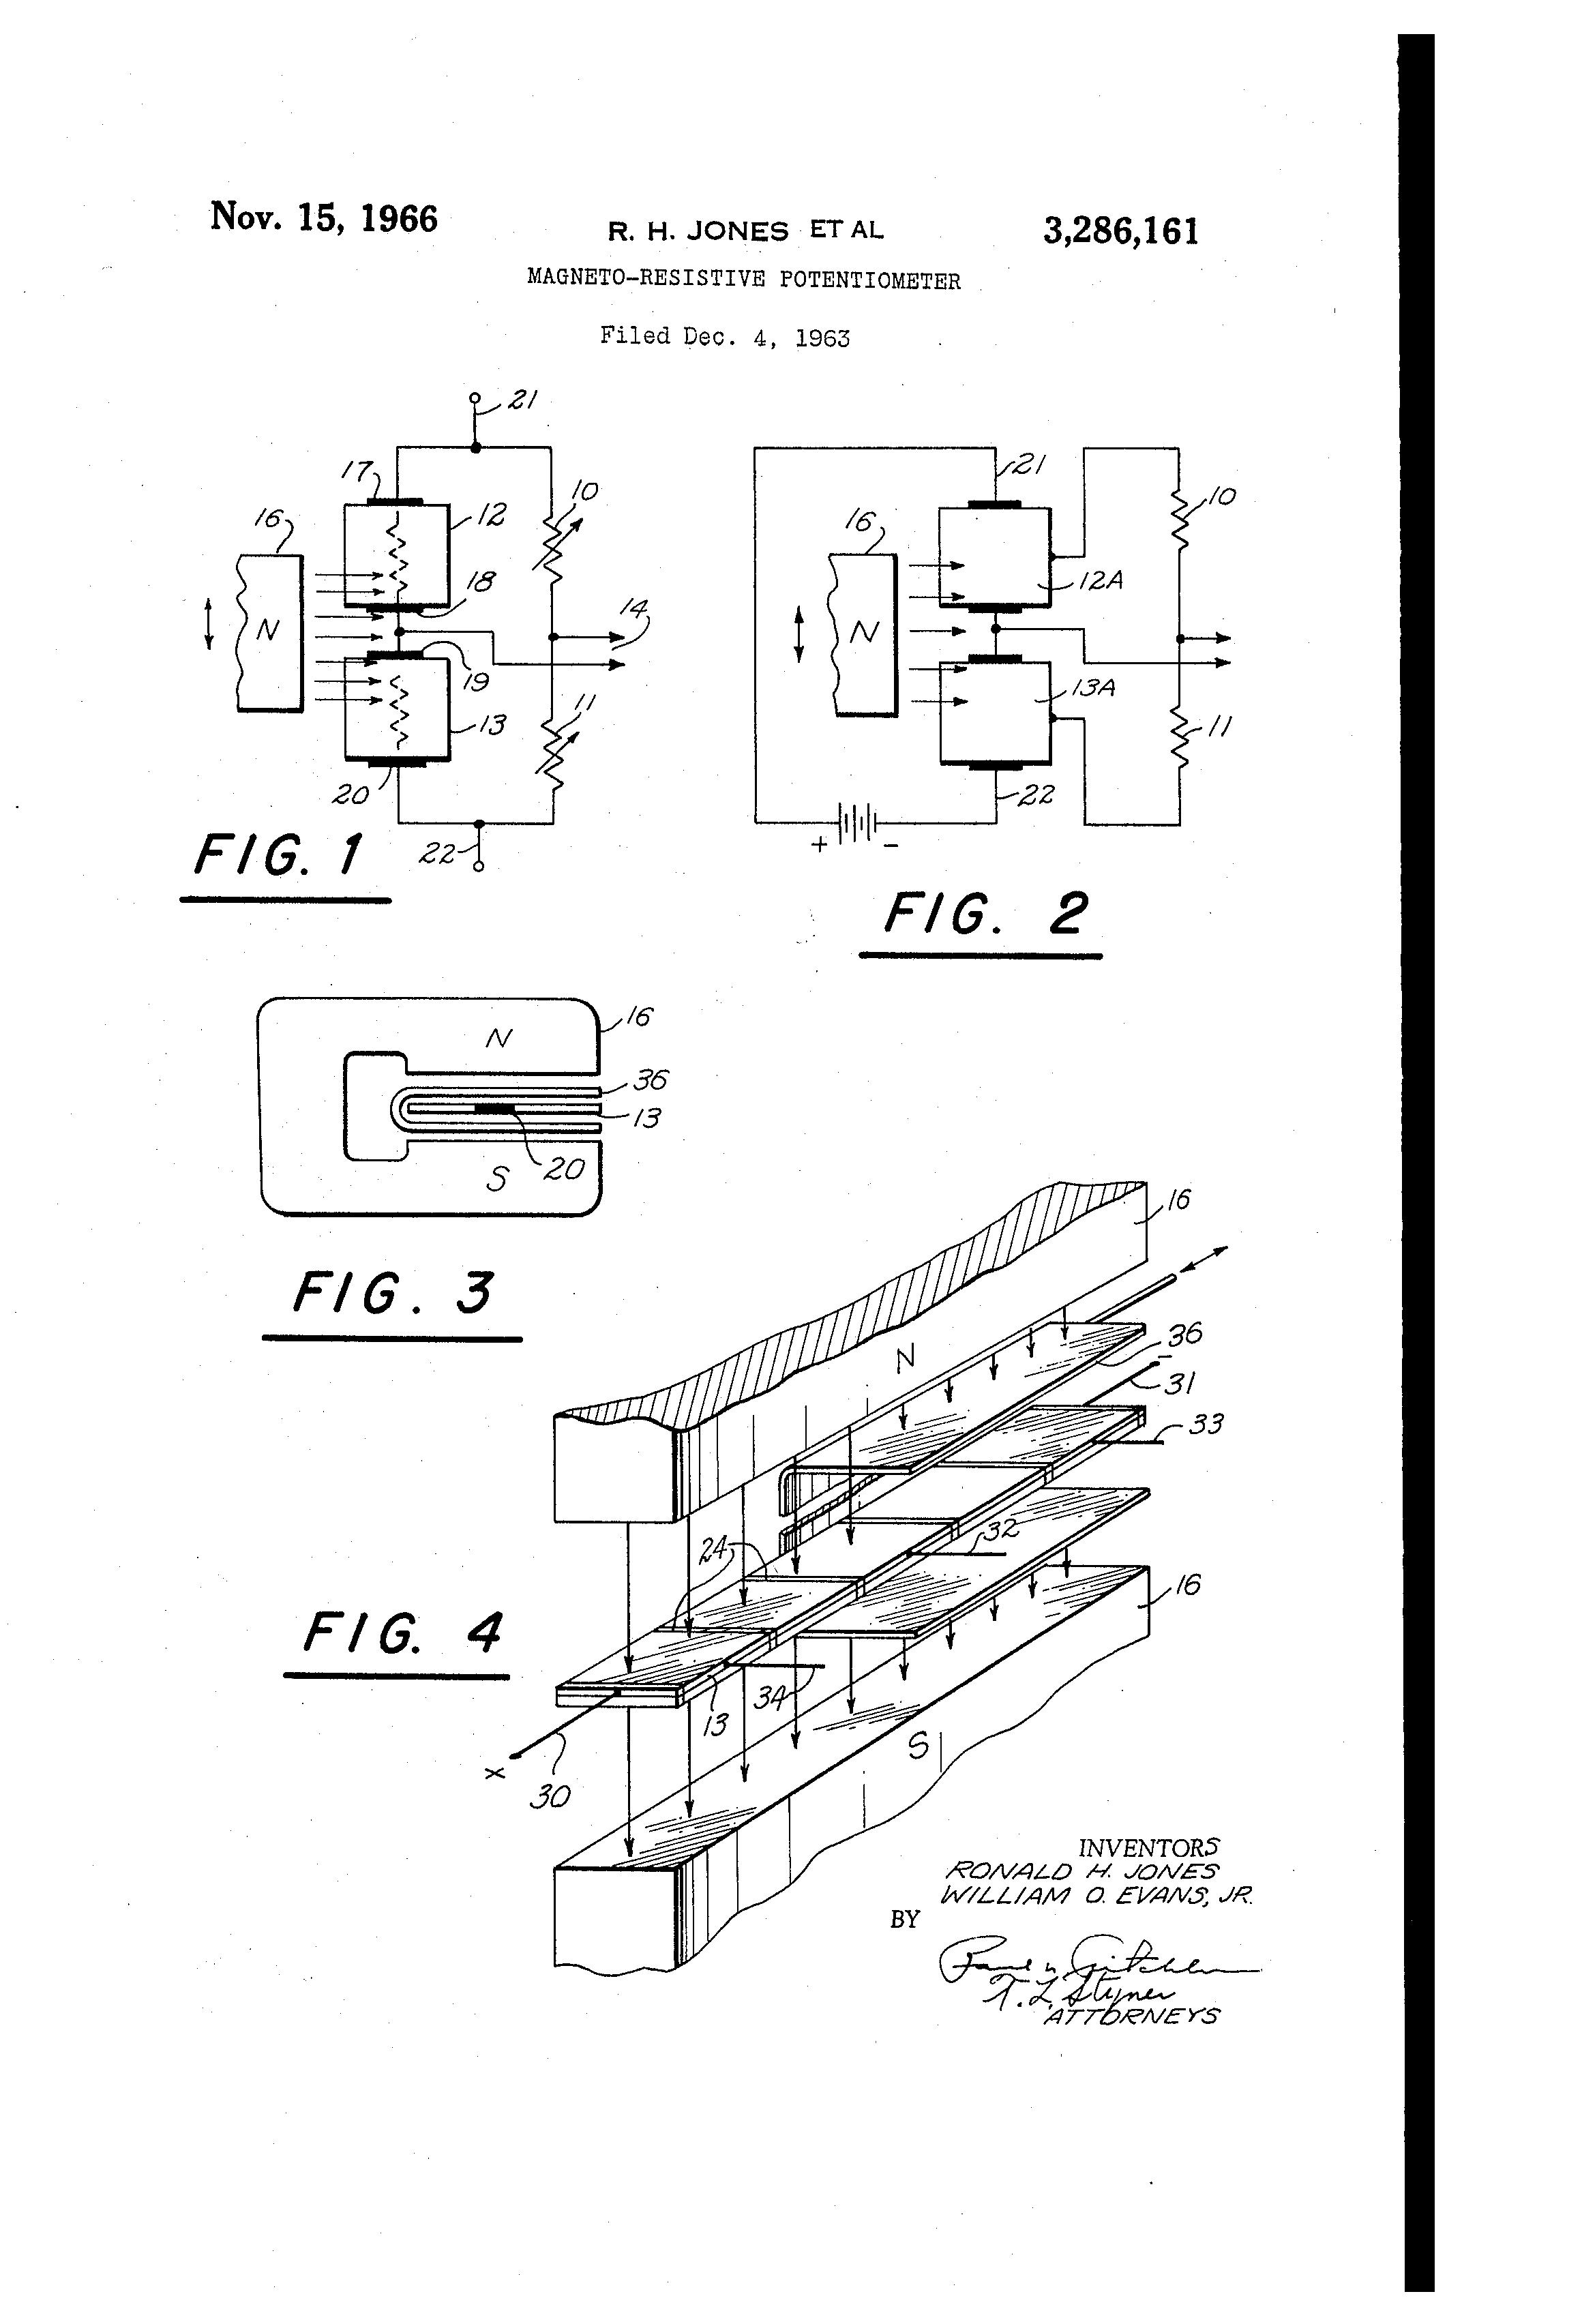 ez go wiring diagram on ez go battery diagram, 1996 ez go wiring diagram,